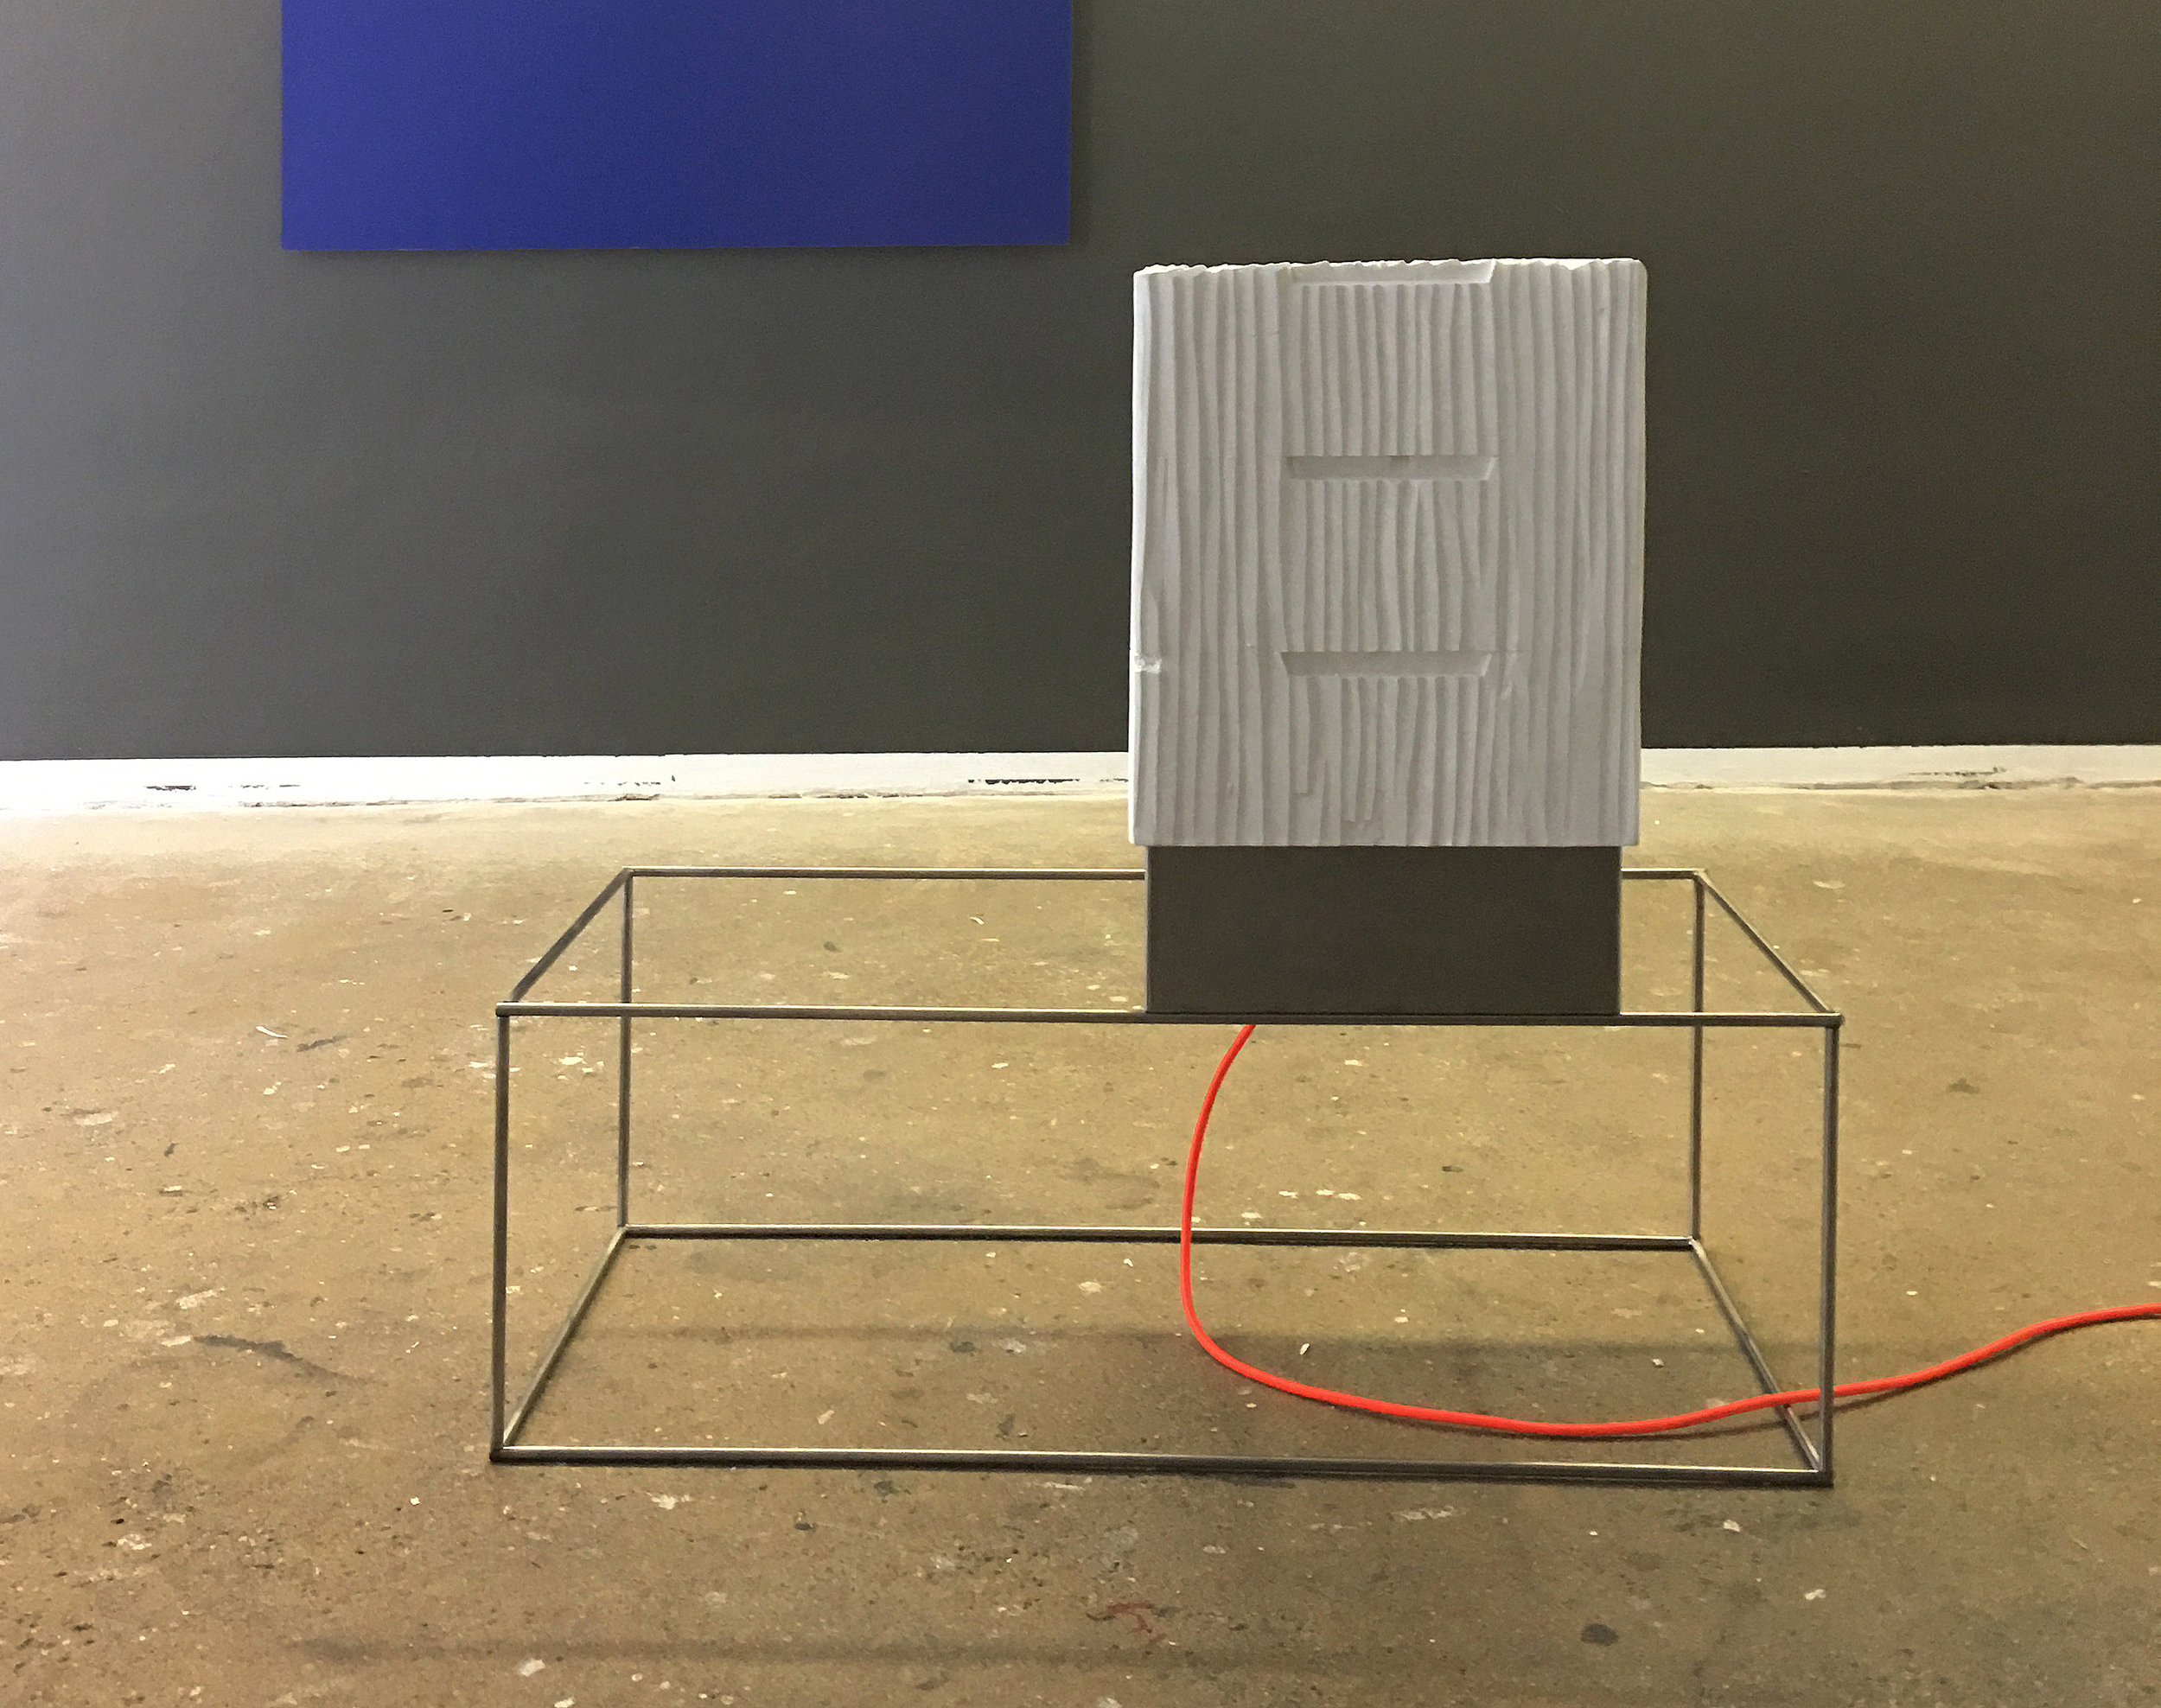 web222-floorlamp-vertical-horizontal-gislela-stiegler-marionfriedmanngallery-view-horizontal-unlit.jpg